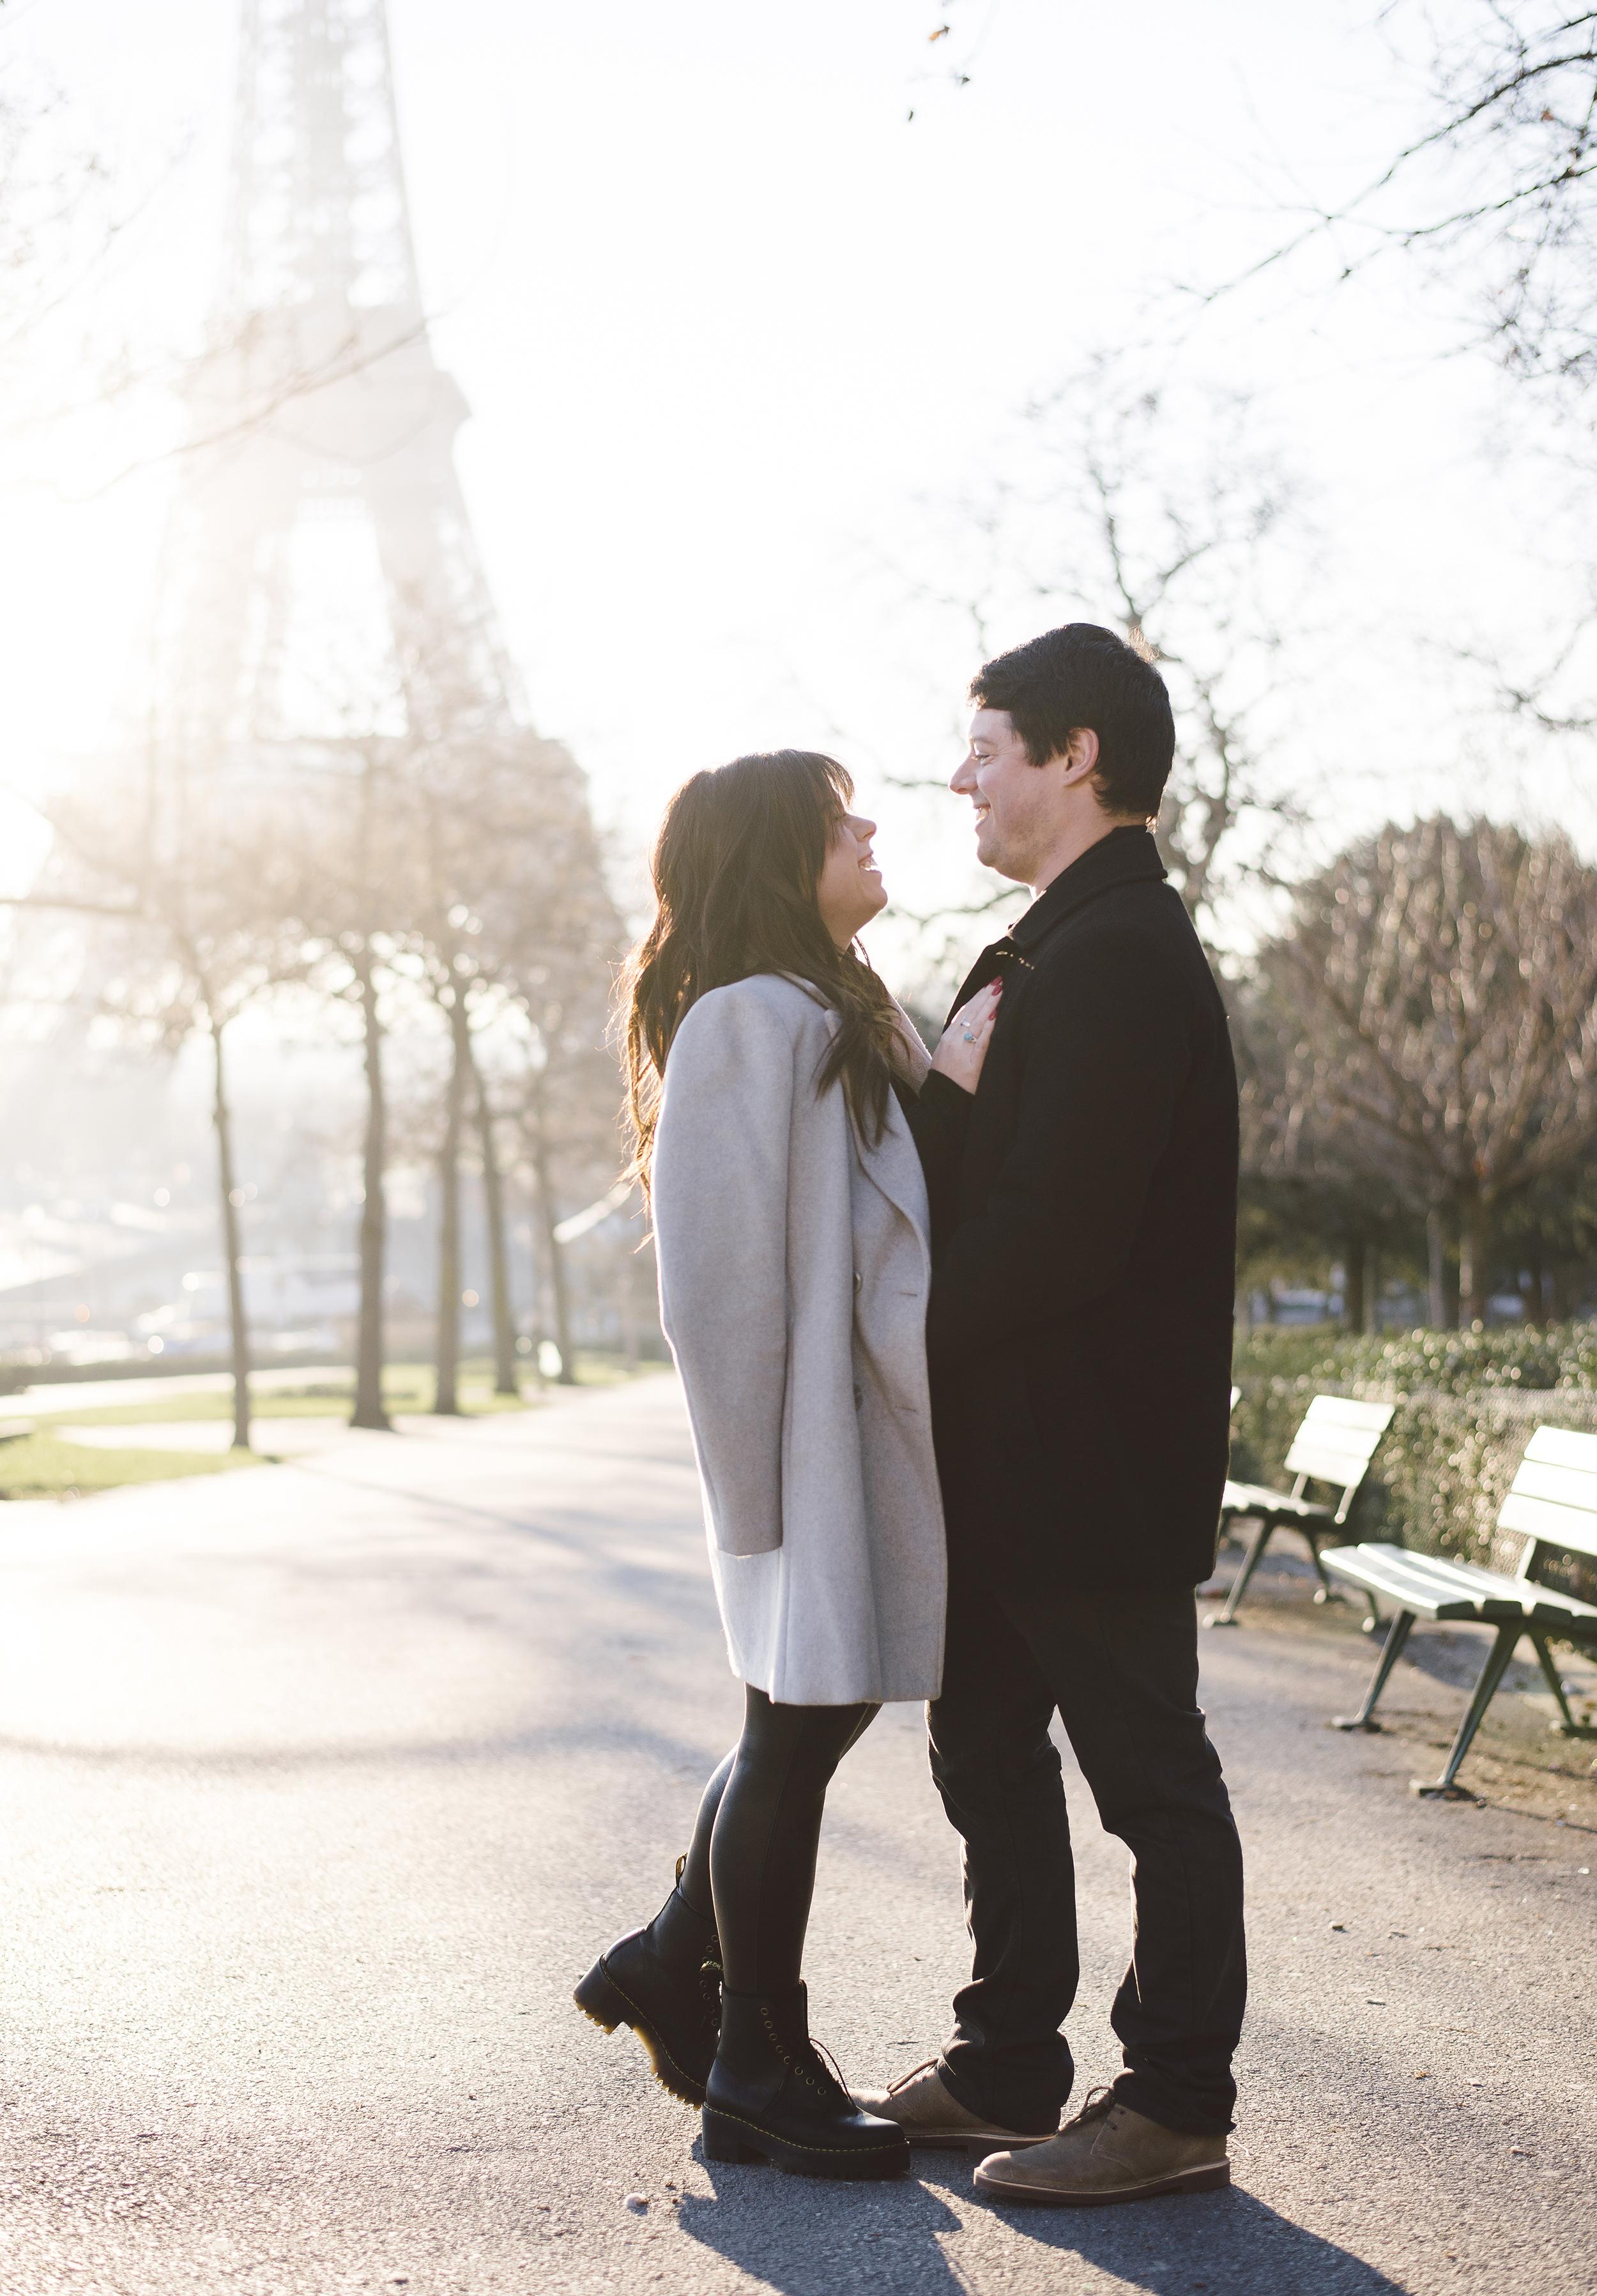 Anniversary-photoshoot-Paris-Trocadero-EiffelTower-Cafe-031.jpg